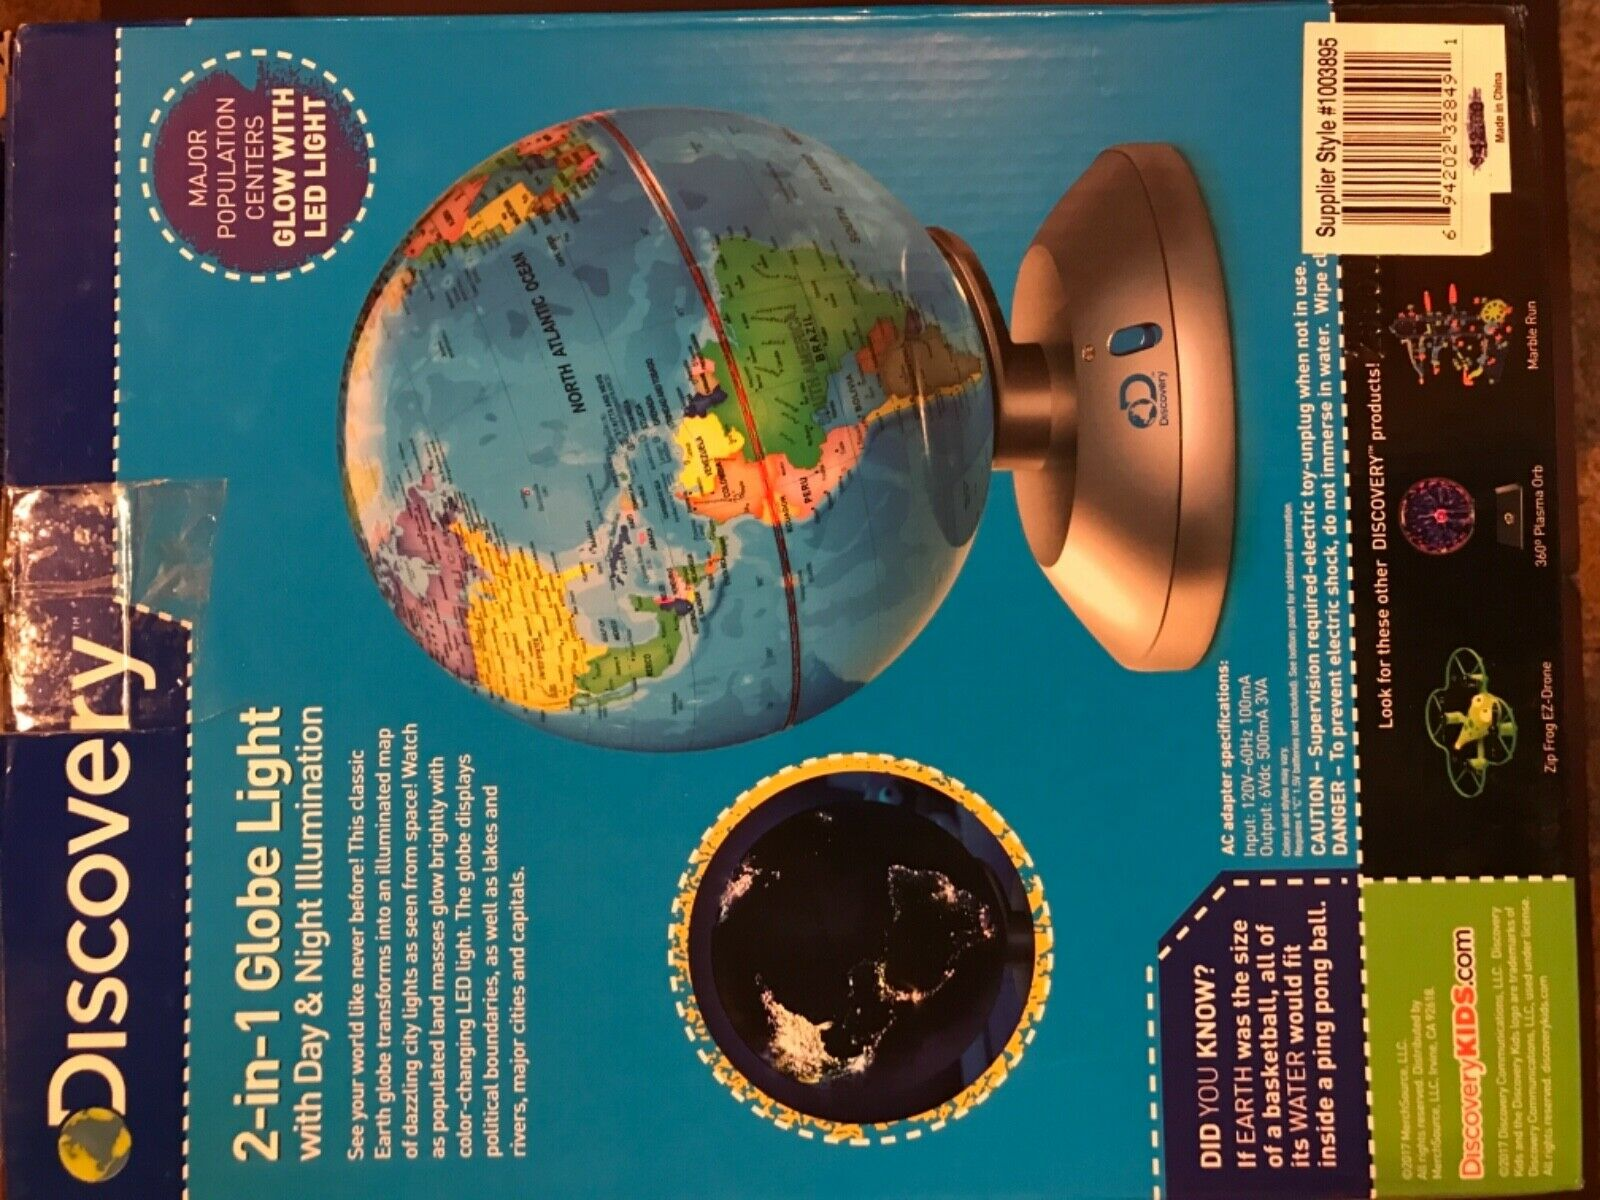 New Discovery 2-in-1 Globe Light Day /& Night Illumination in Open Box